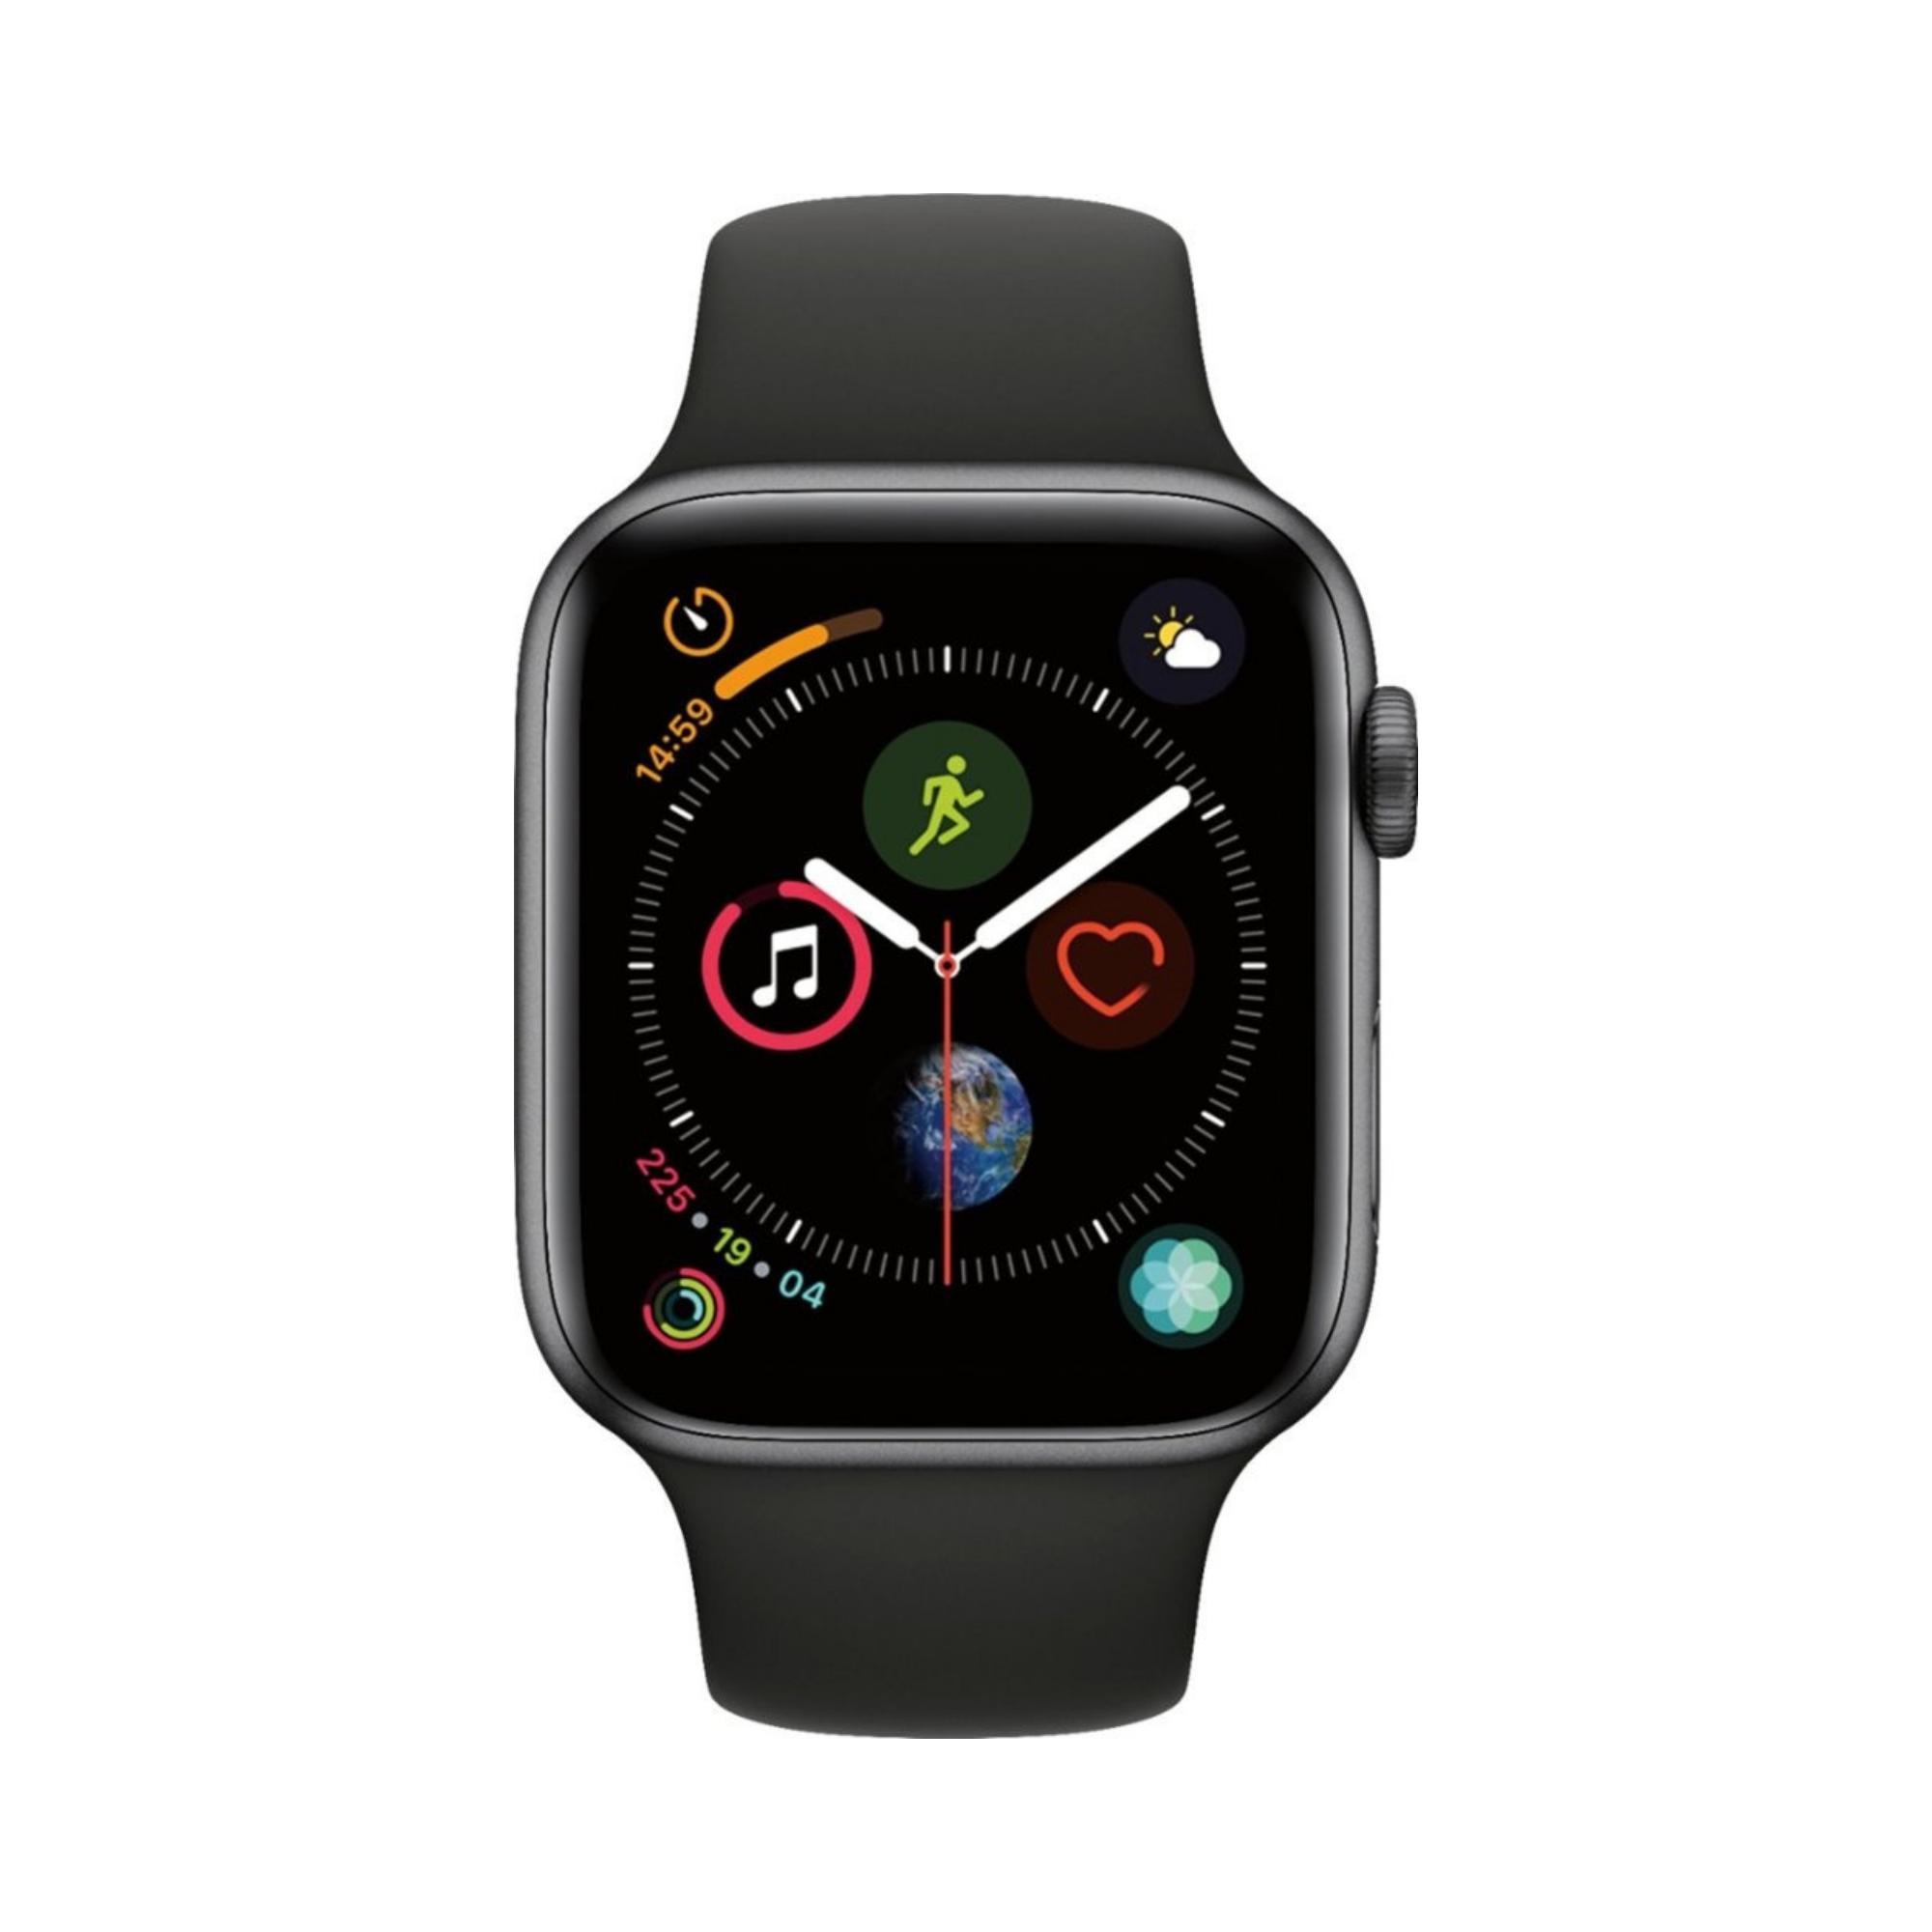 Apple Watch Series 4 - 40mm GPS Only — Macbook & iMac Financing